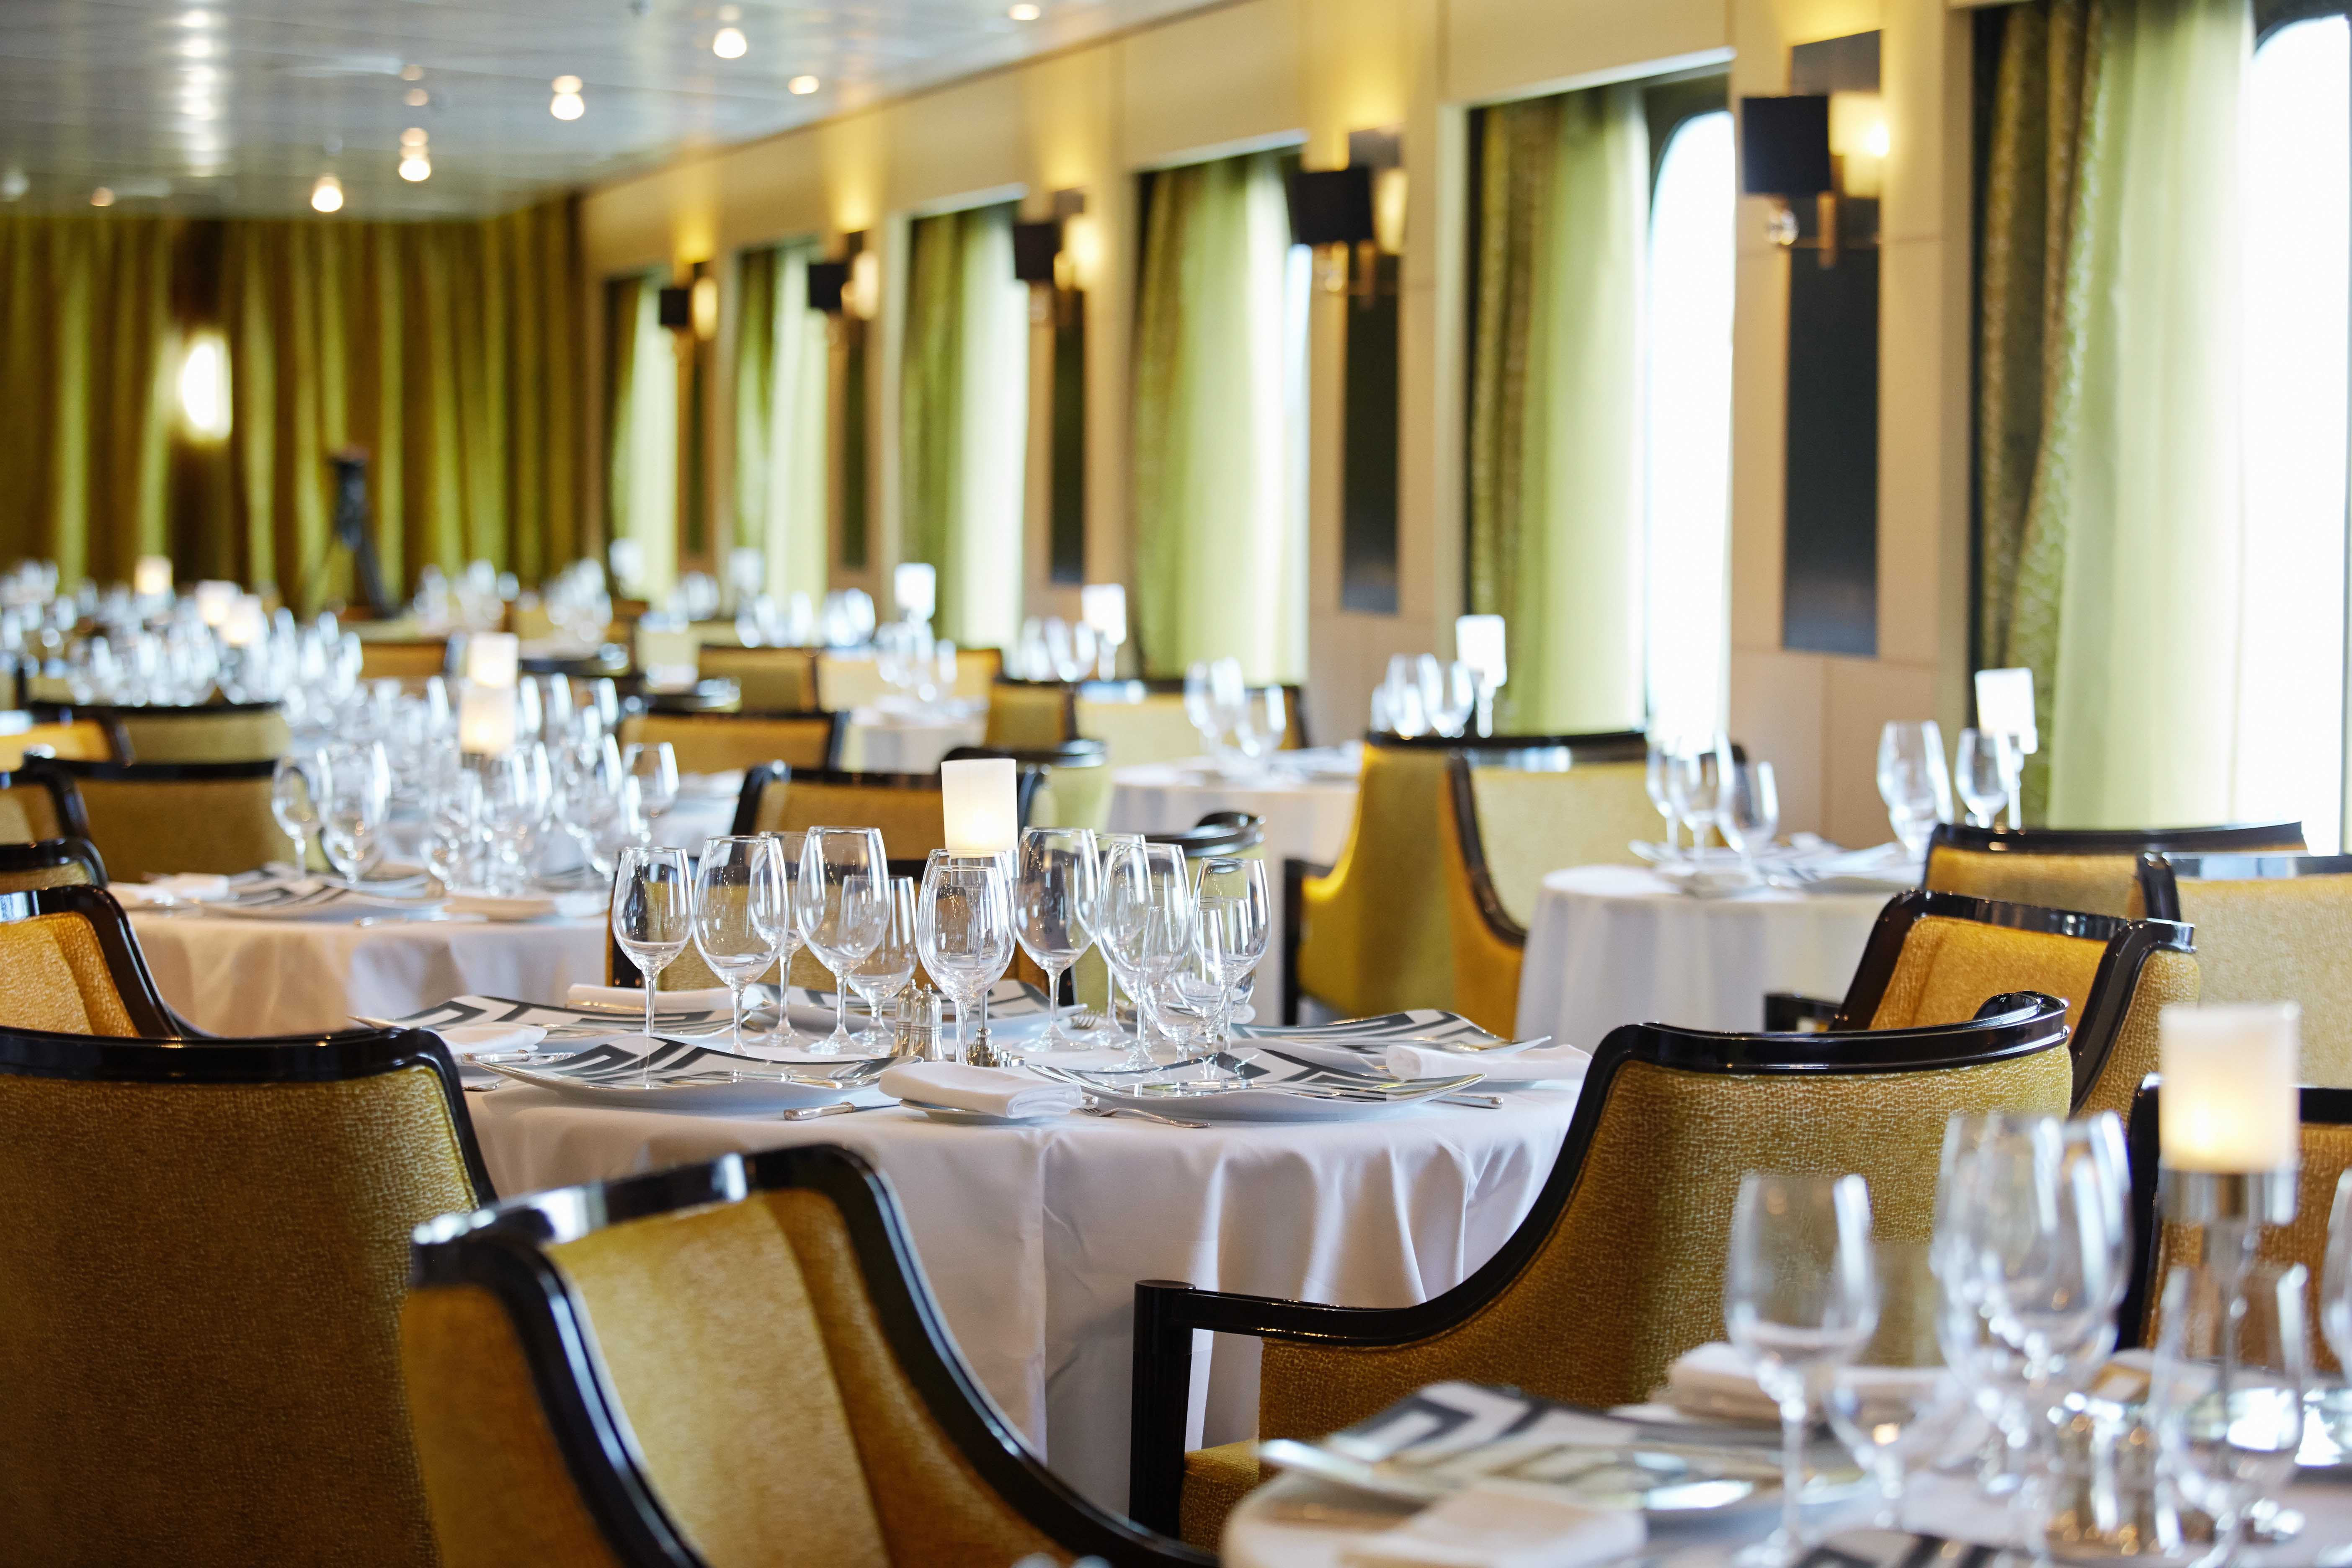 Seven Seas Mariner - Chartreuse Restaurant